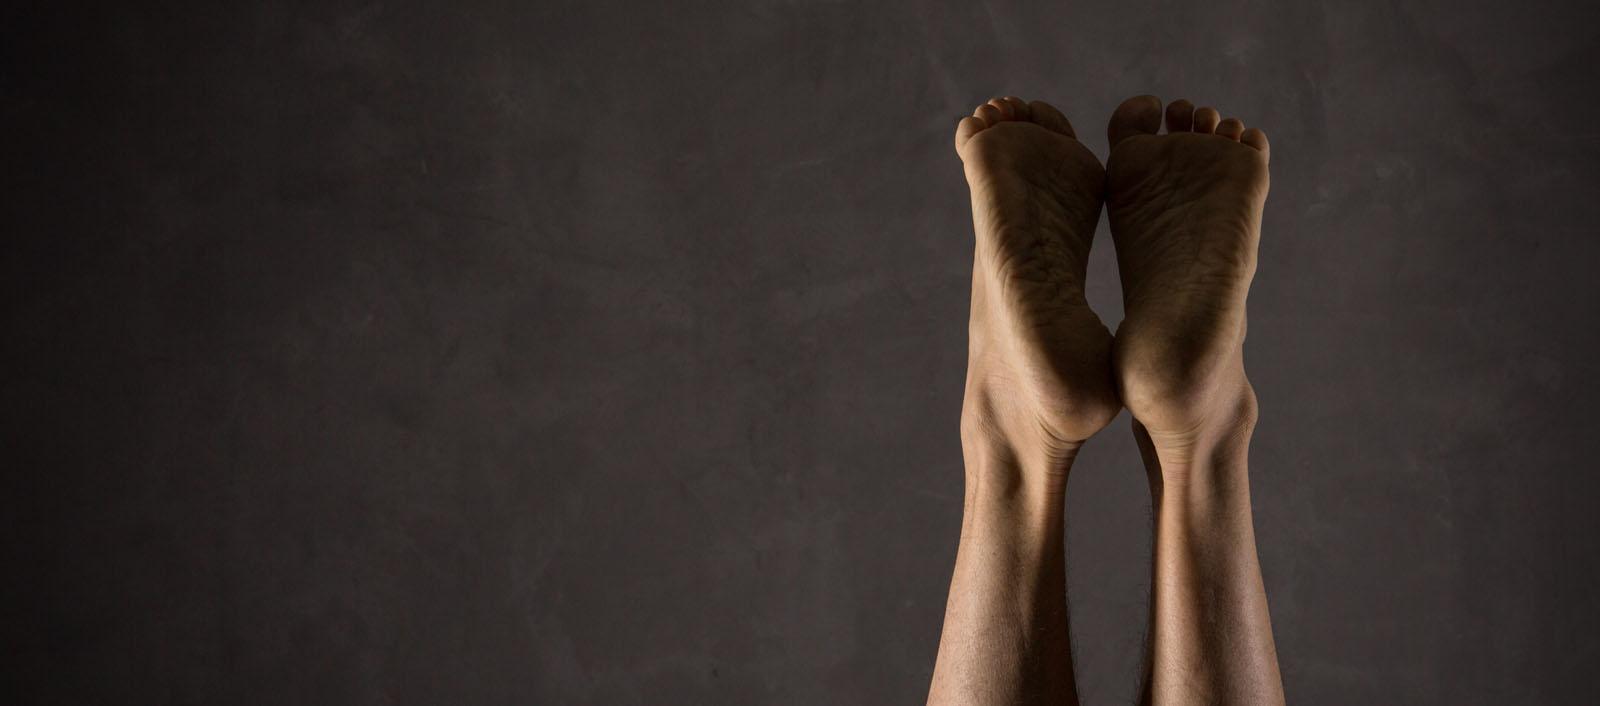 contact cours de yoga Neuchâtel contact